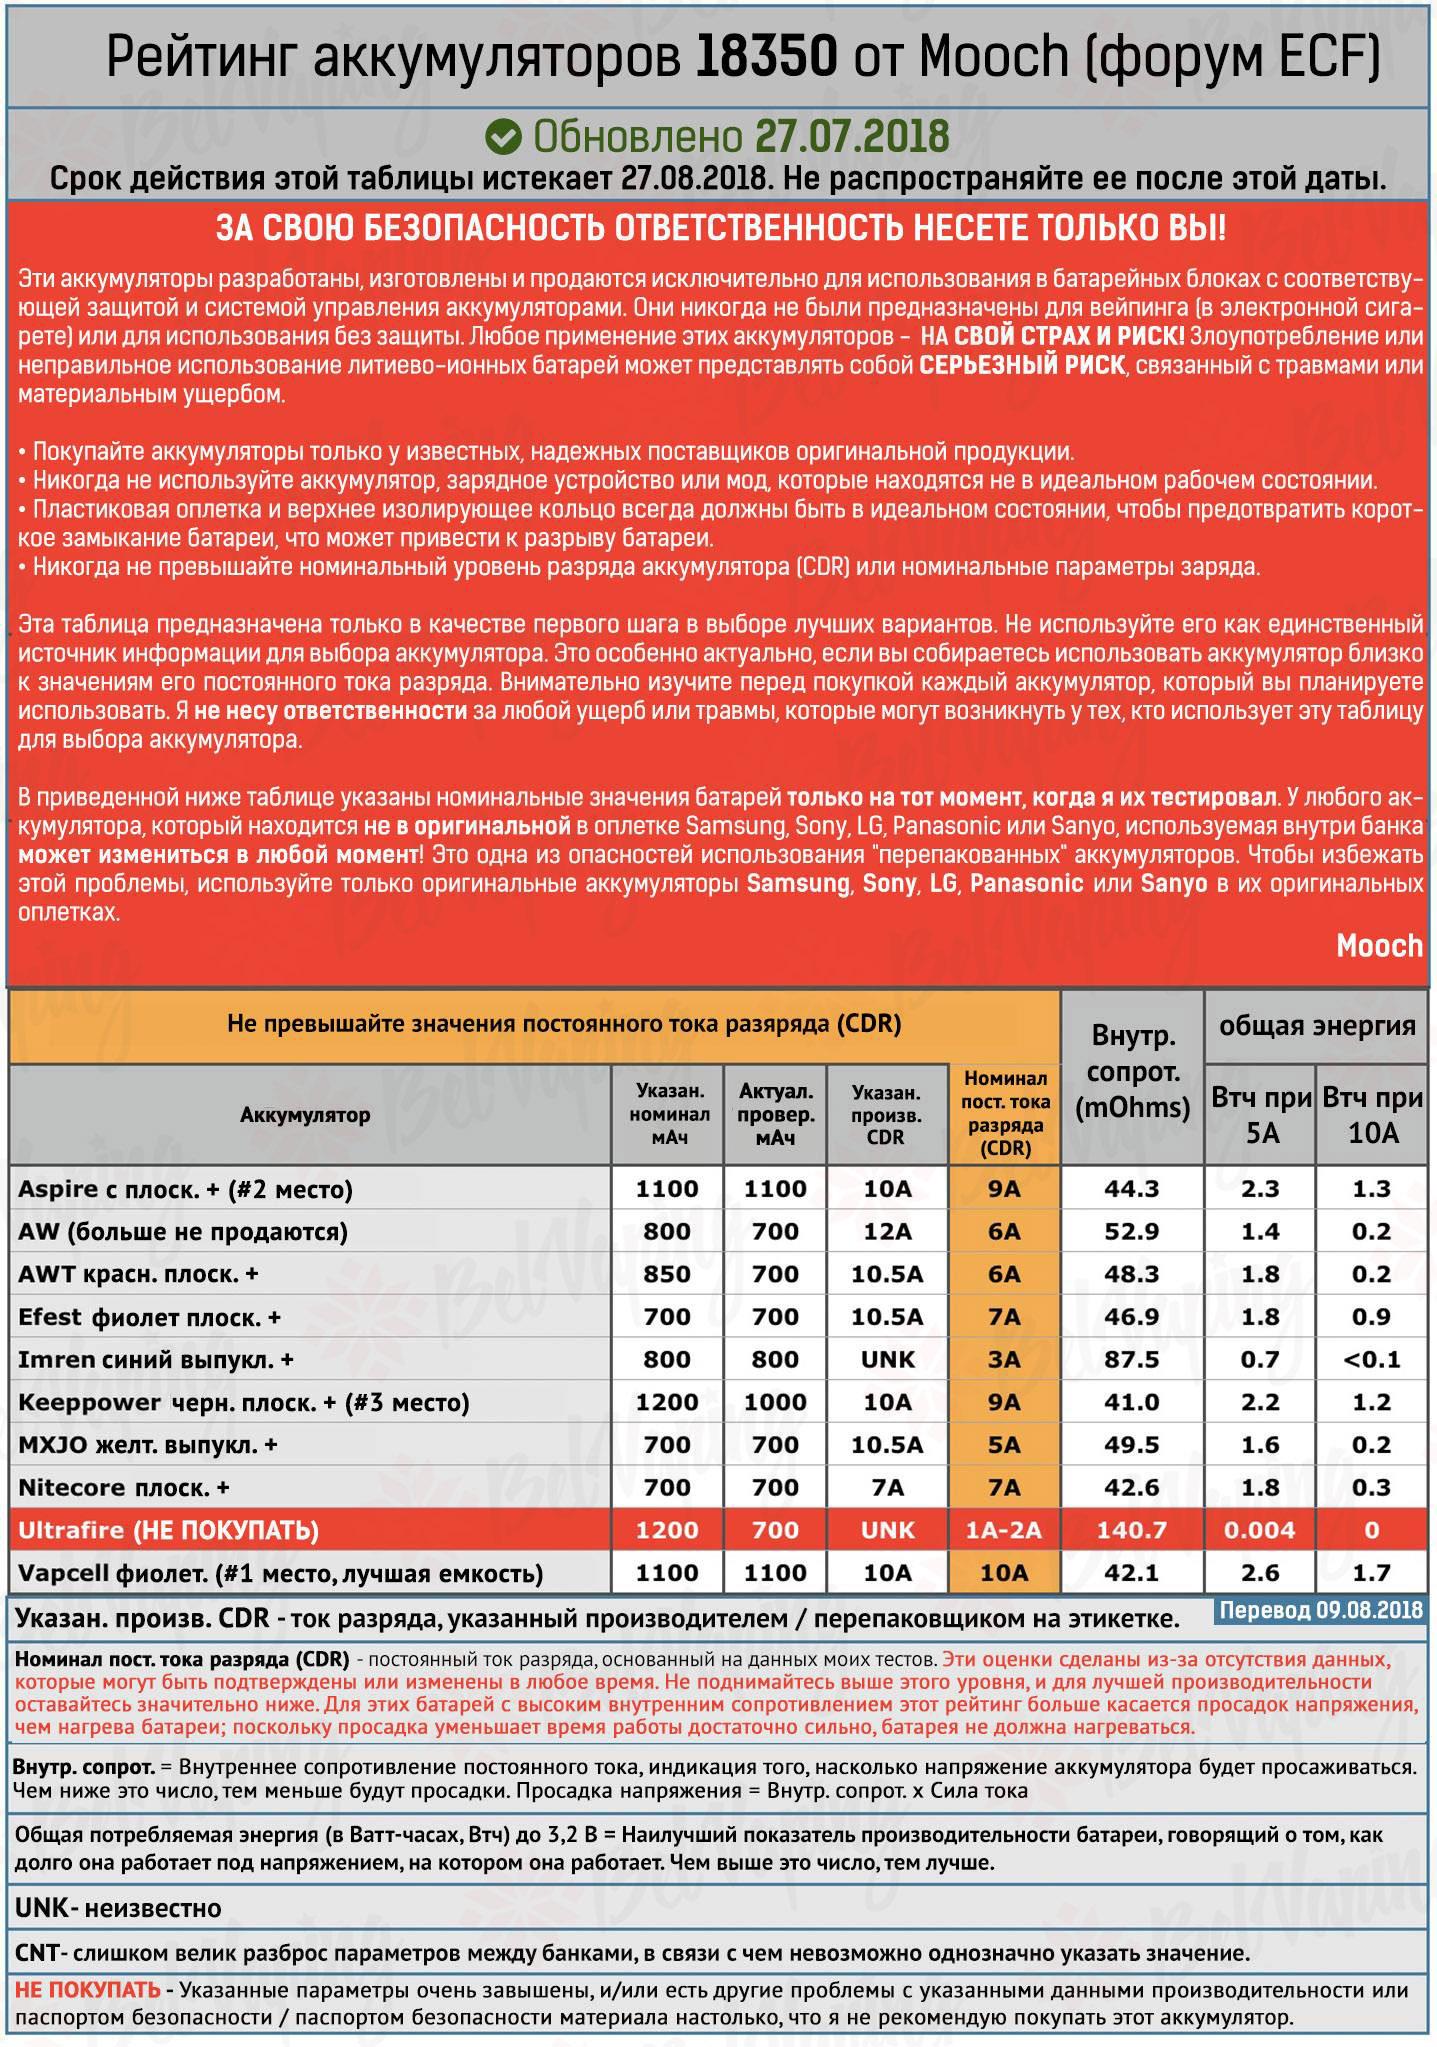 Рейтинг аккумуляторов 18350 и 18500 от Mooch